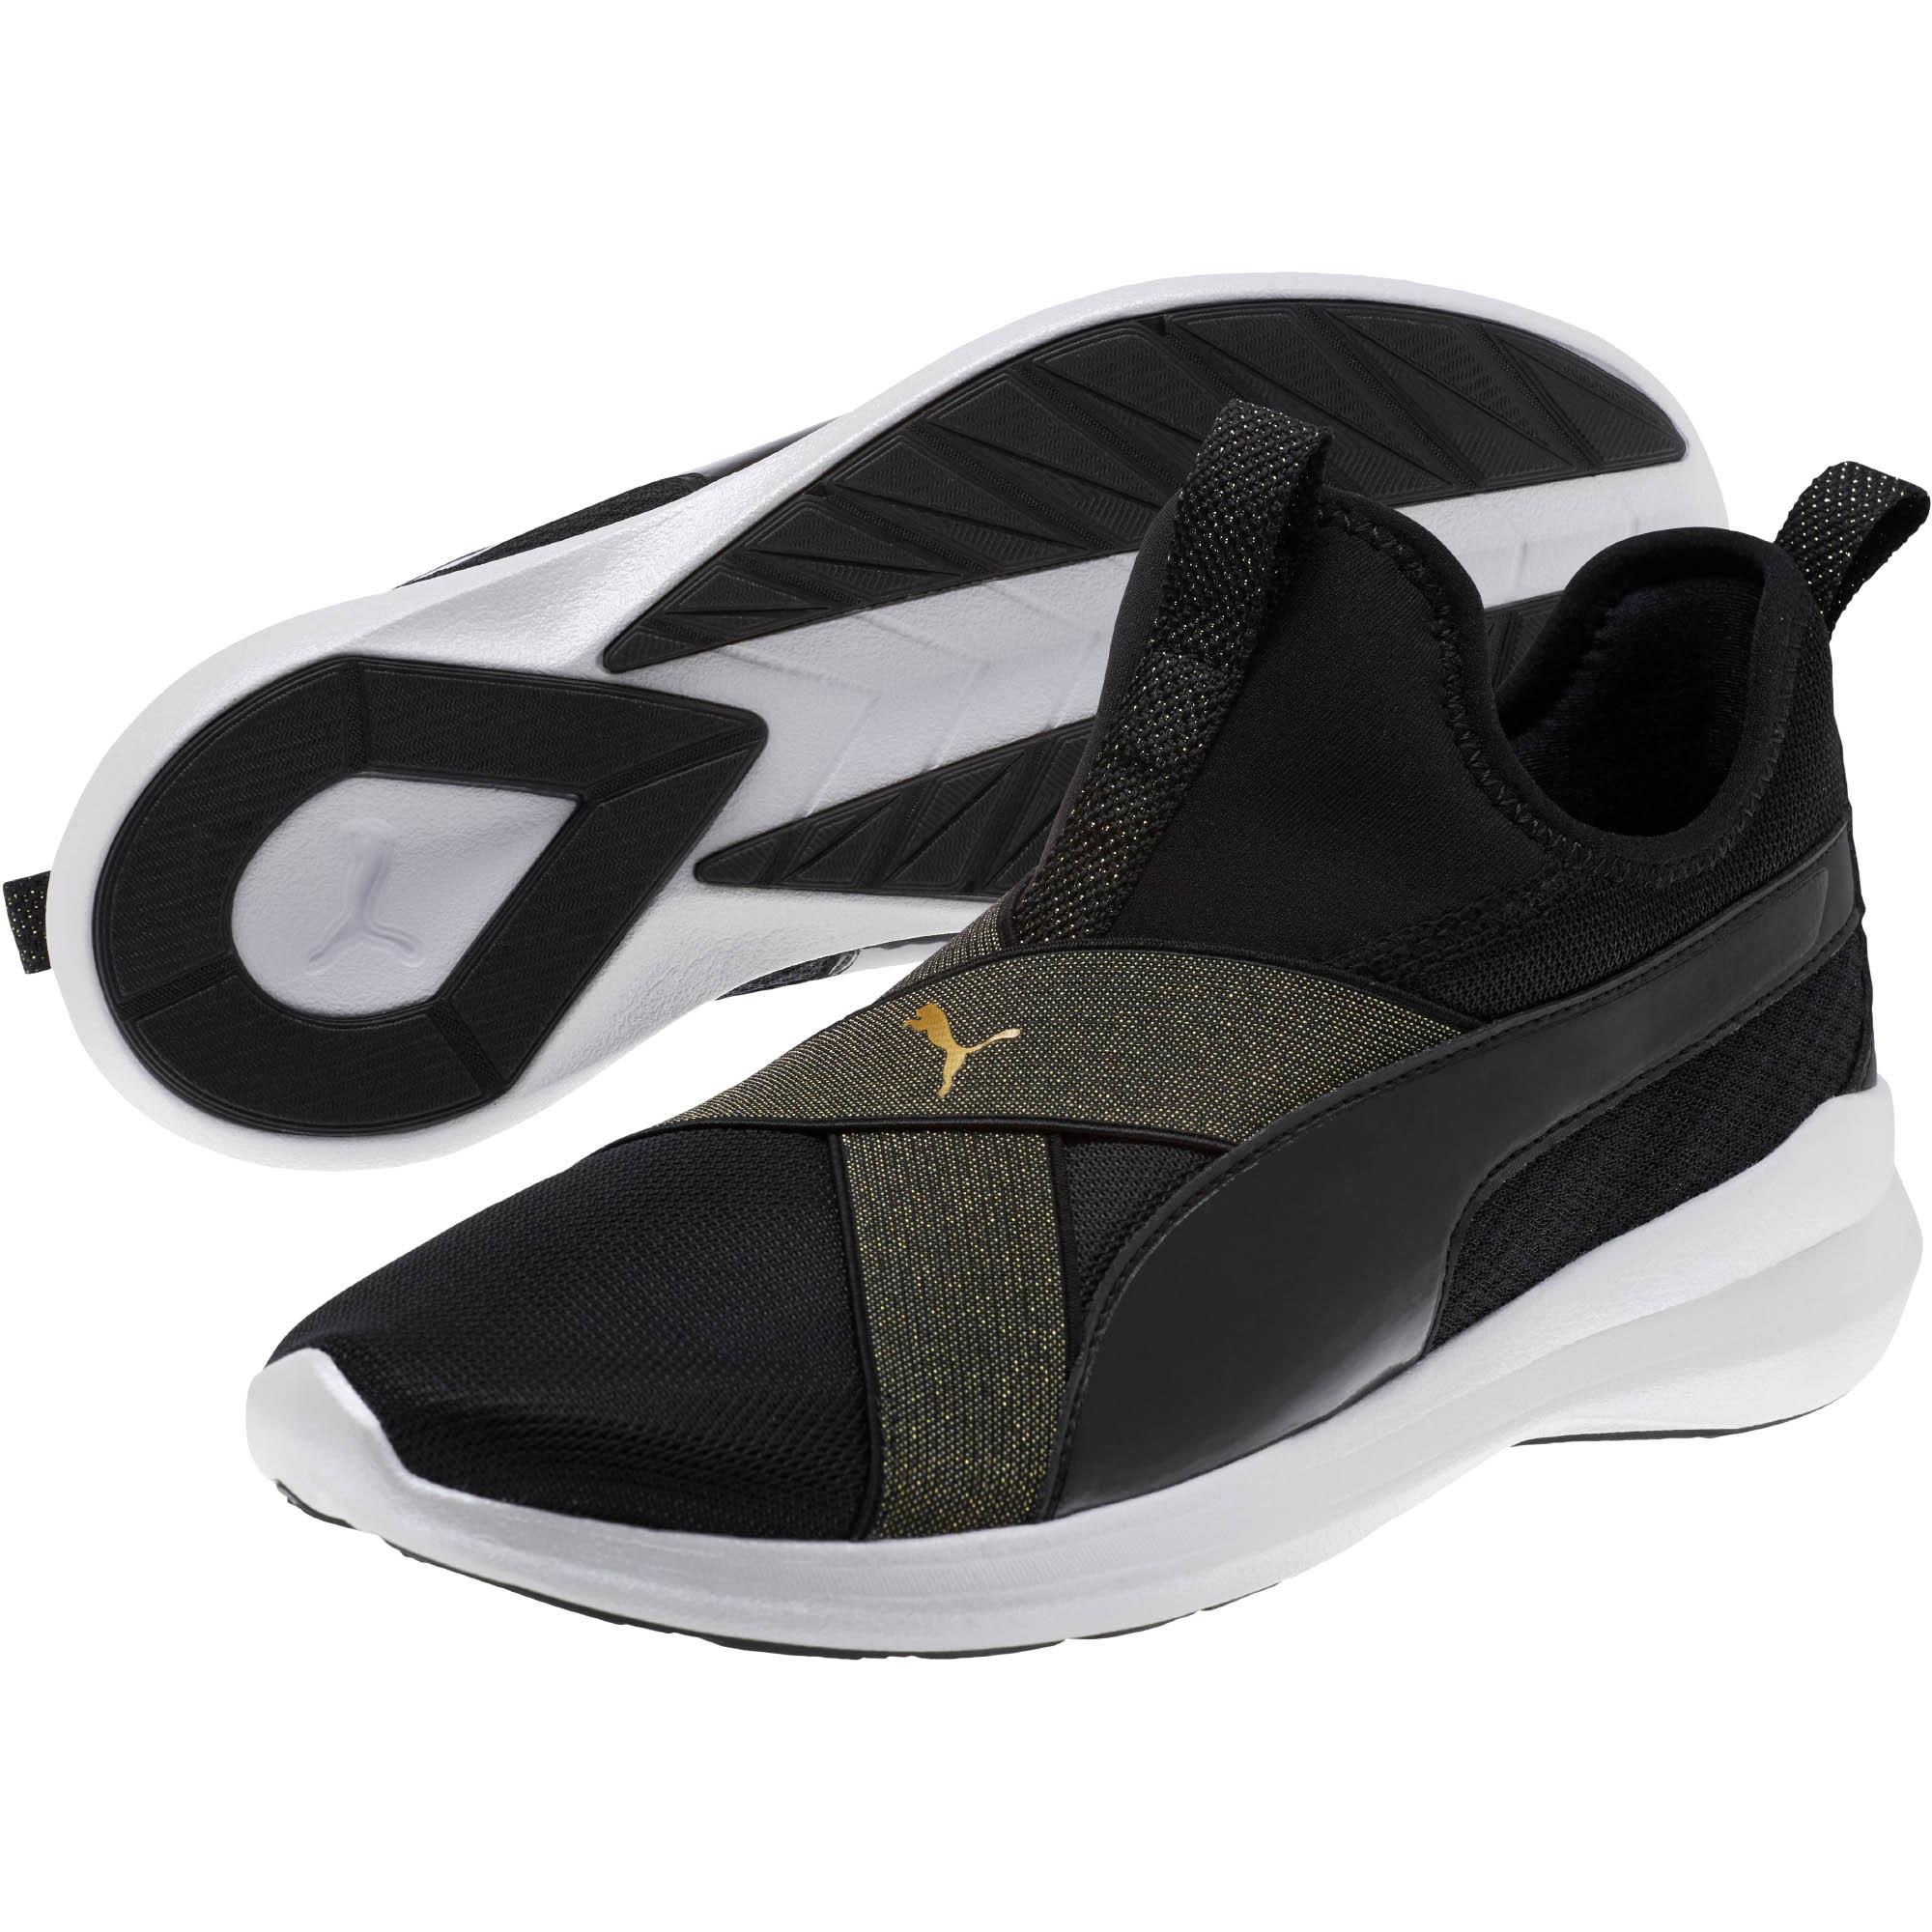 Official Puma Store  PUMA Rebel X Bling Women s Sneakers  a3878e51f